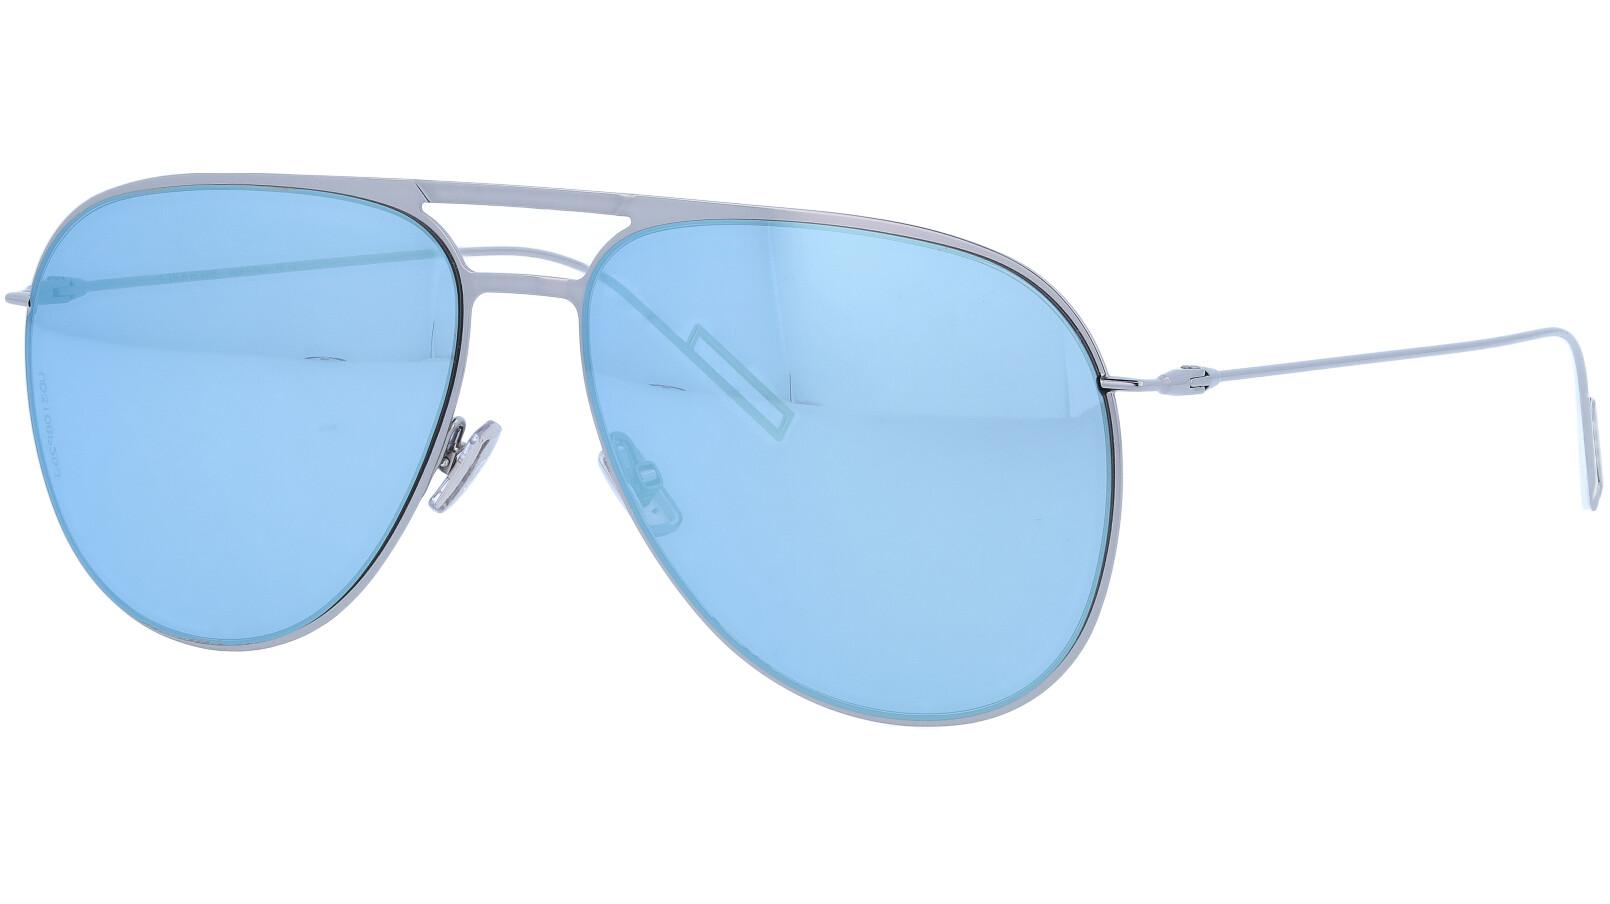 Dior 0205S 84JMD 59 PALLAD Sunglasses